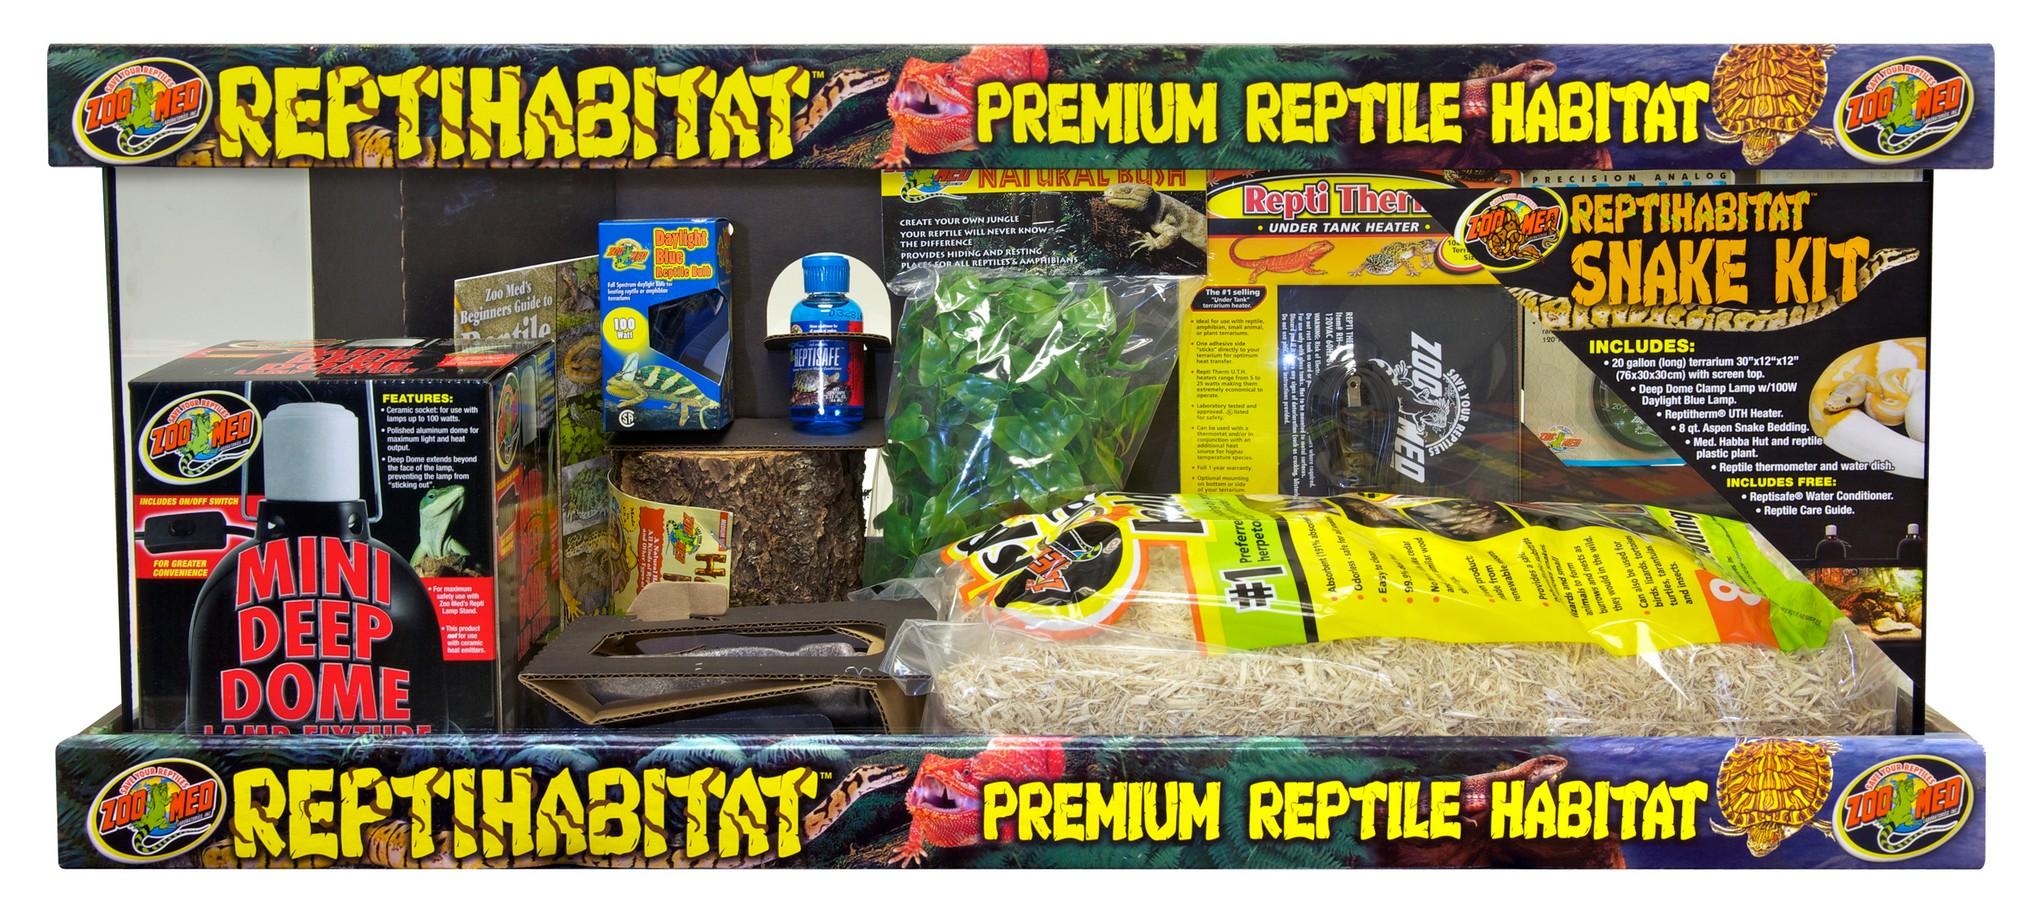 Zoo Med Reptihabitat Premium Reptile Habitat Snake Kit